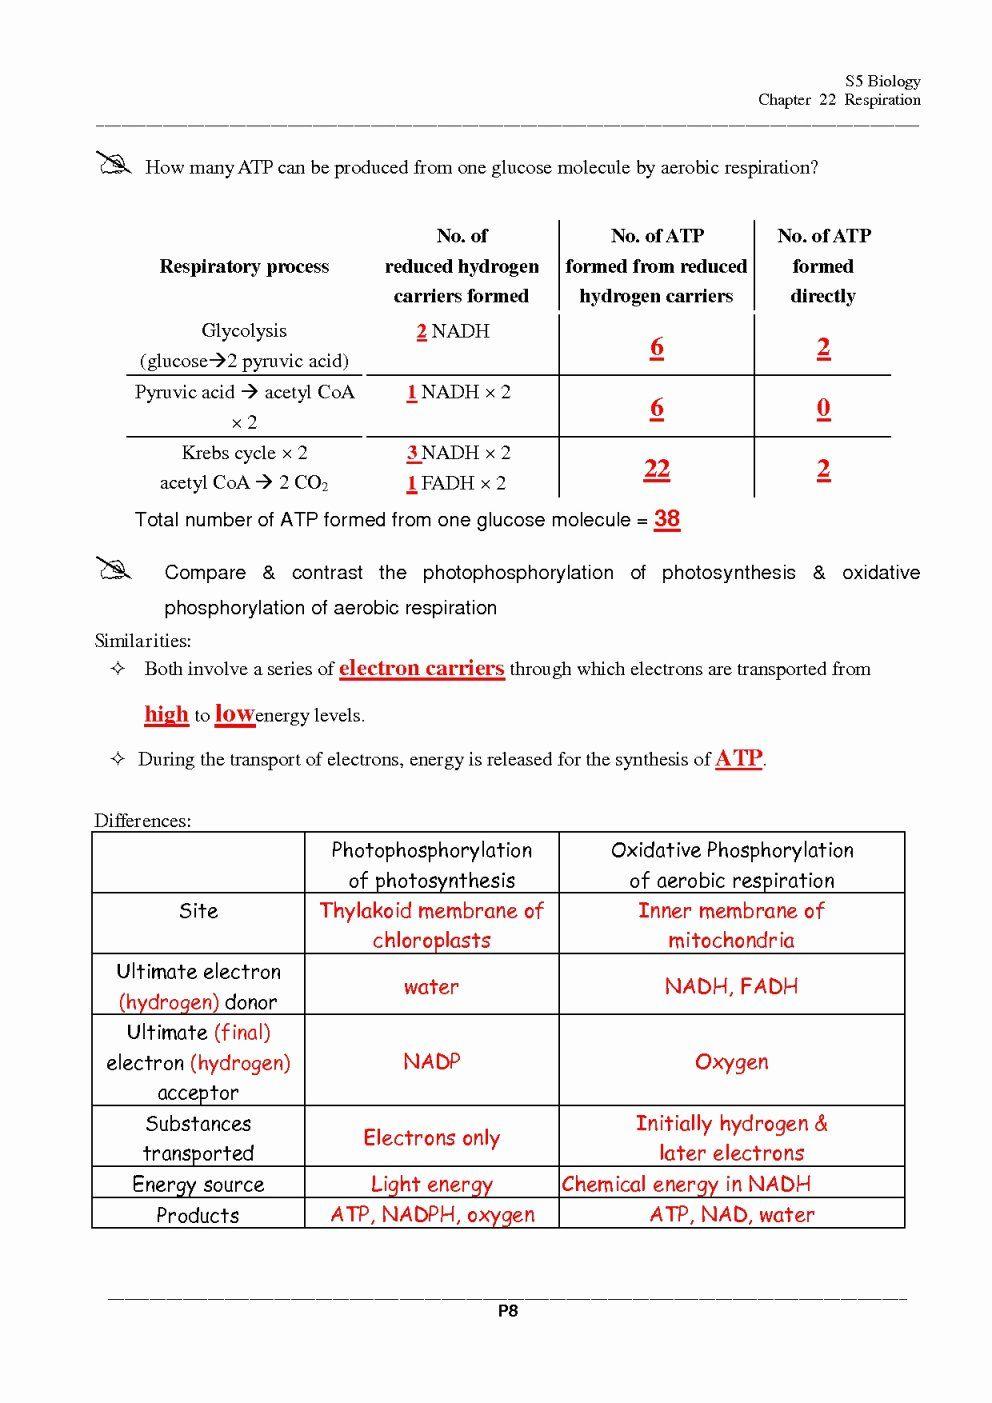 Cellular Respiration Worksheet Answer Key Luxury Cellular Respiration Worksheet Answers Che In 2020 Biology Worksheet Persuasive Writing Prompts Cellular Respiration